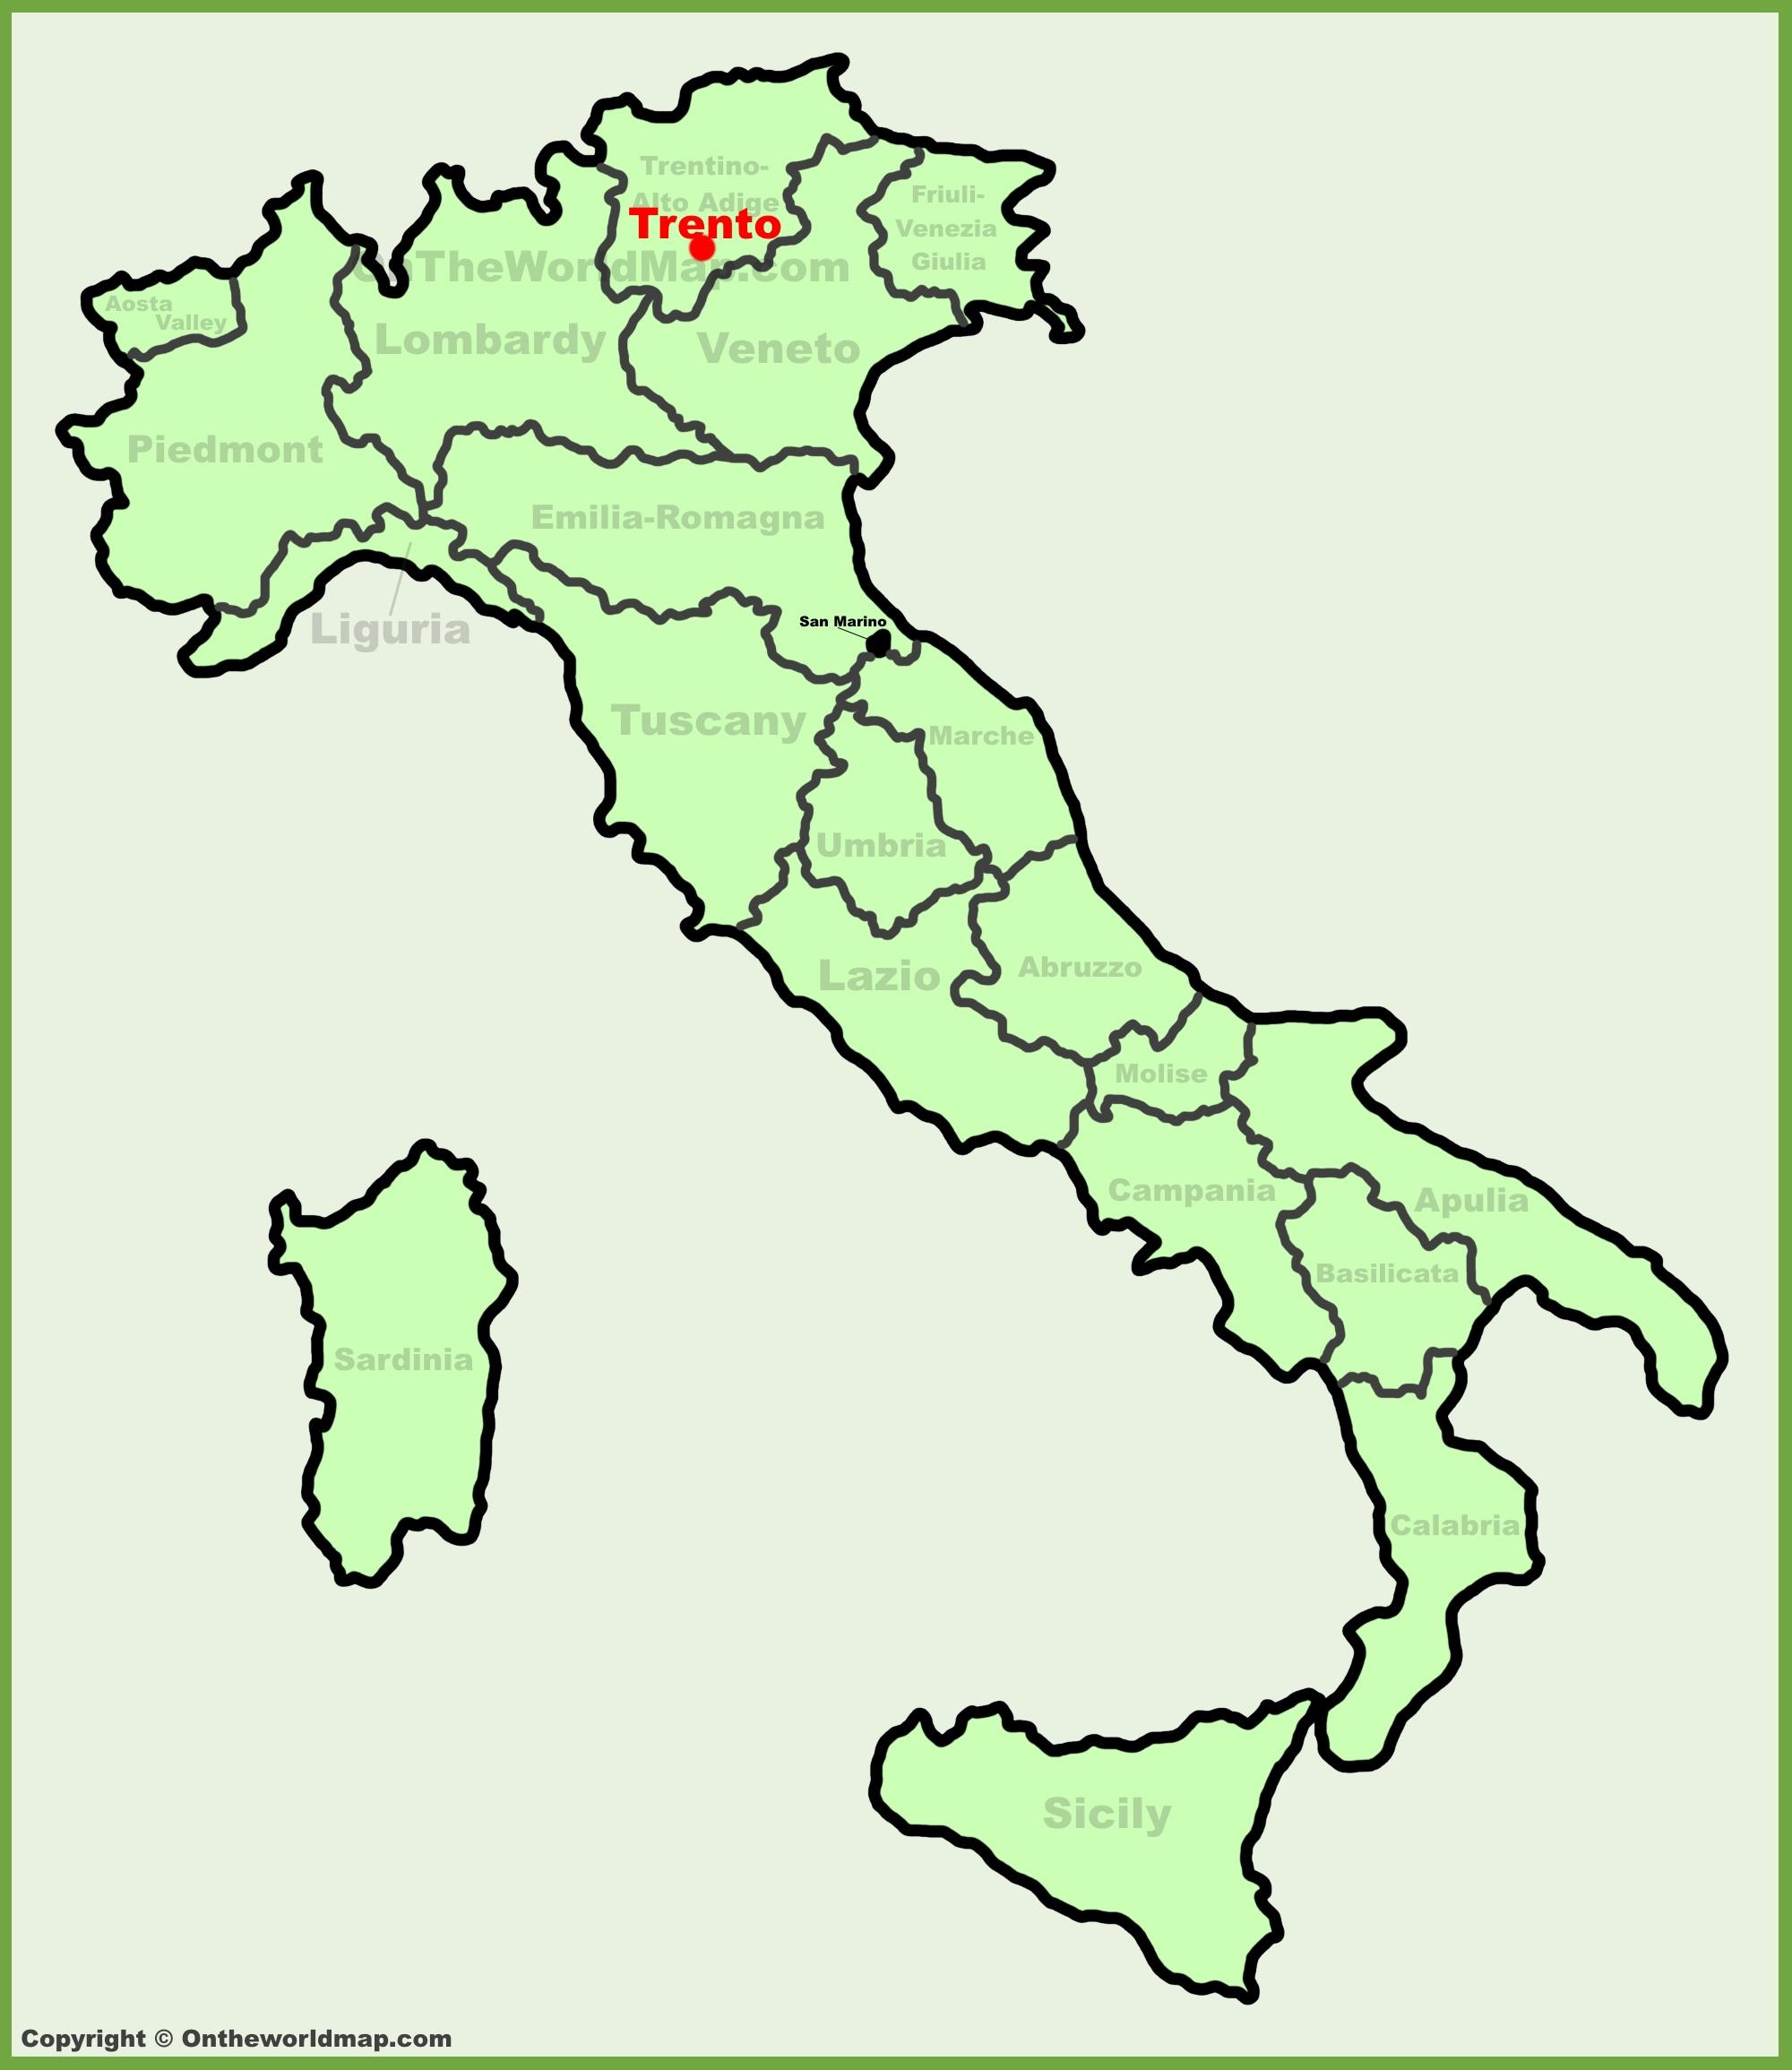 Trento location on the Italy map